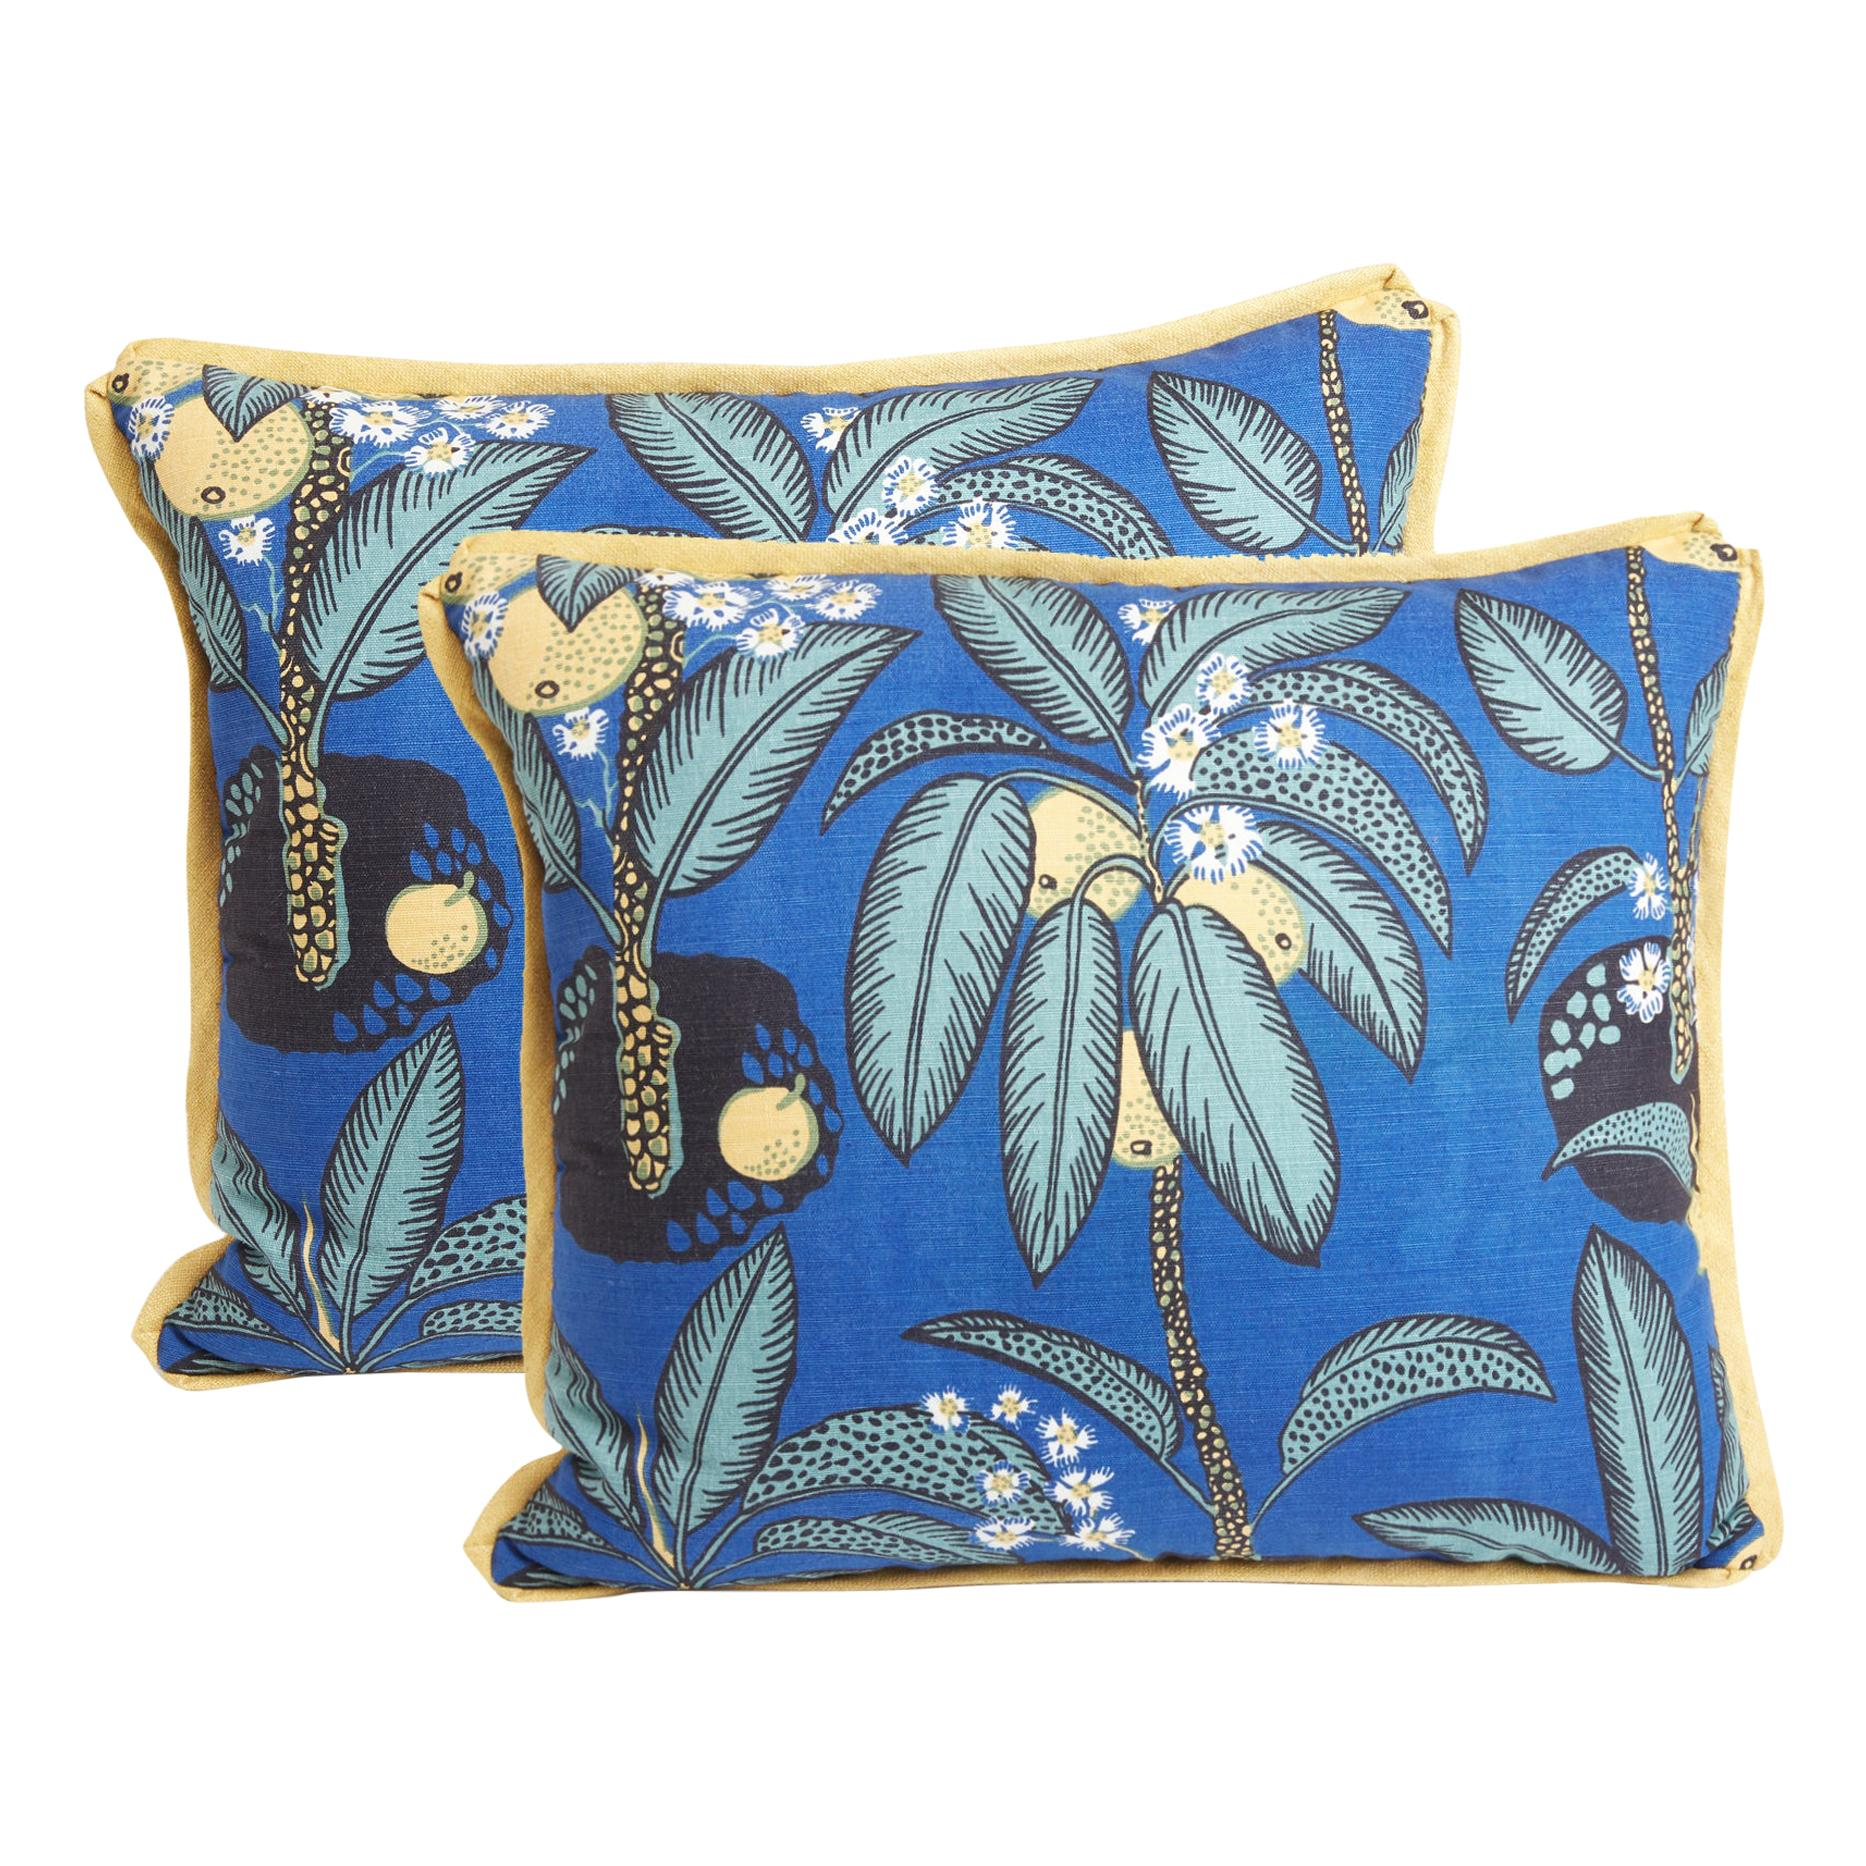 Pair of Josef Frank Rectangular Cushions in the Notturno Pattern, Silk Backing